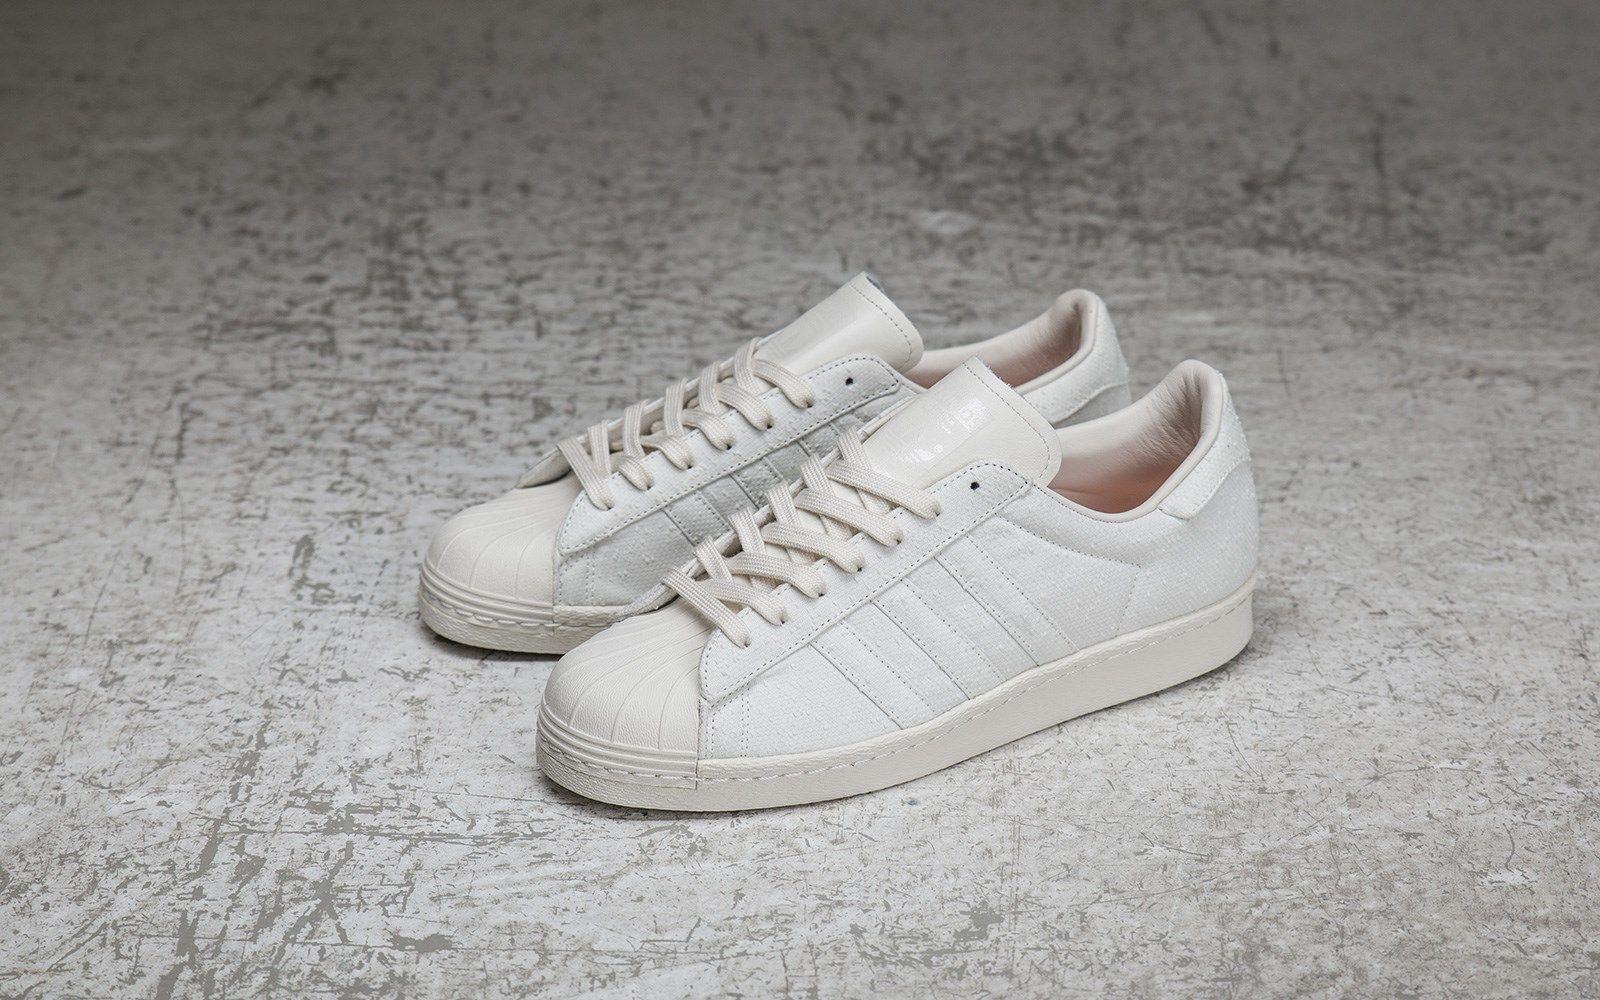 576193df8da4 adidas Superstar - B24347 - Sneakersnstuff